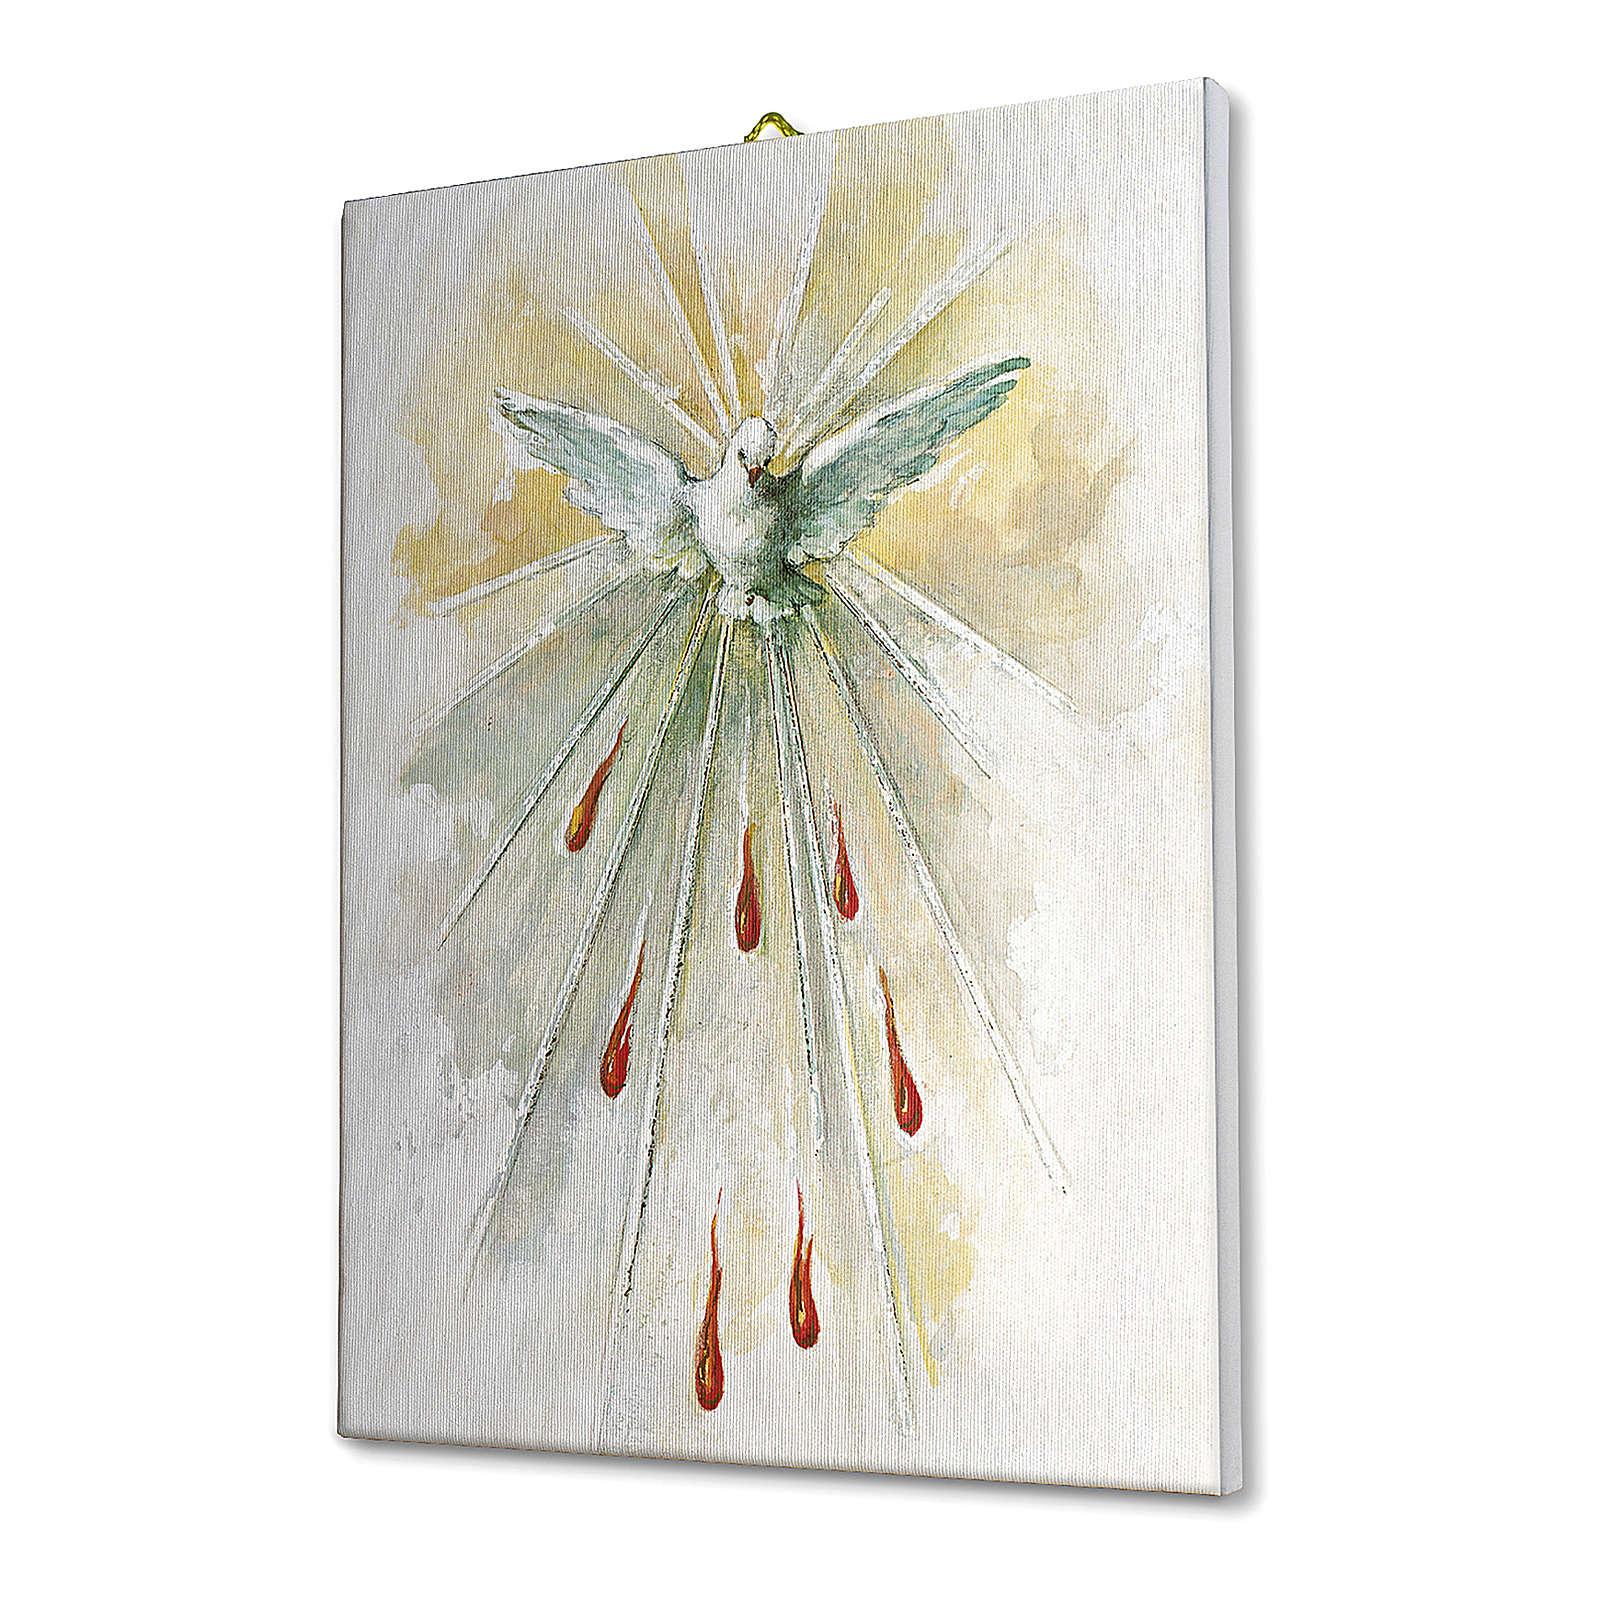 Cuadro sobre tela pictórica Espíritu Santo 70x50 cm 3